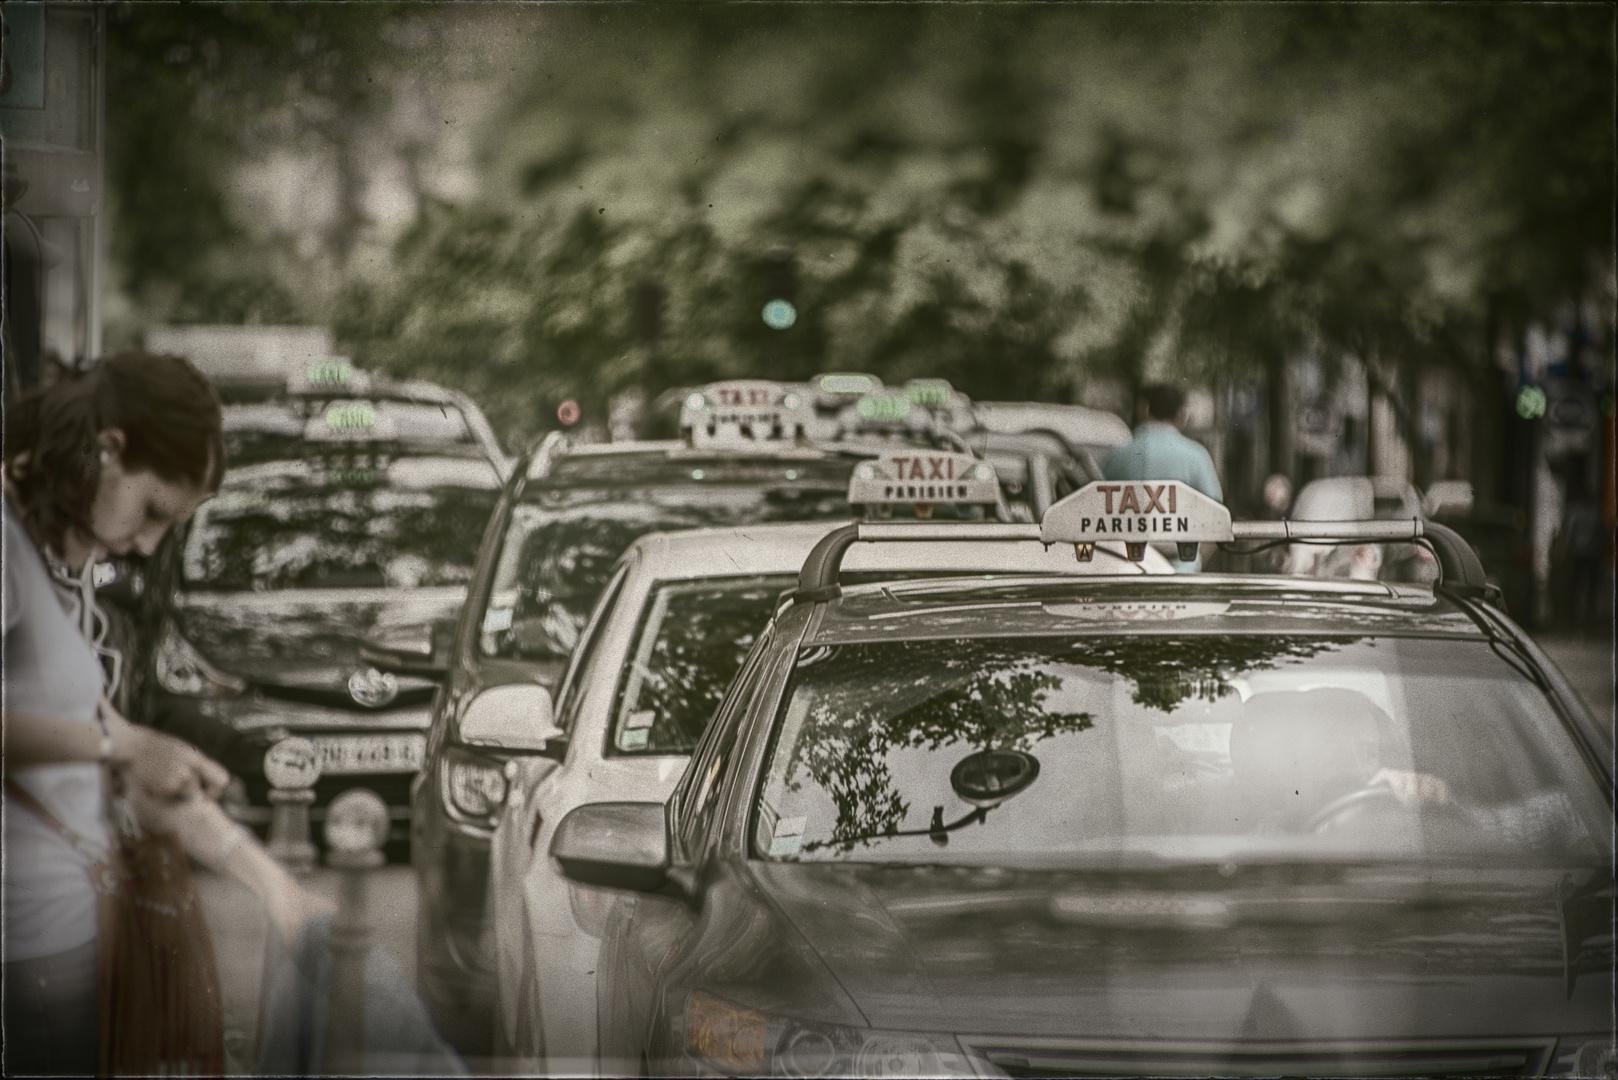 Taxis Parisiens